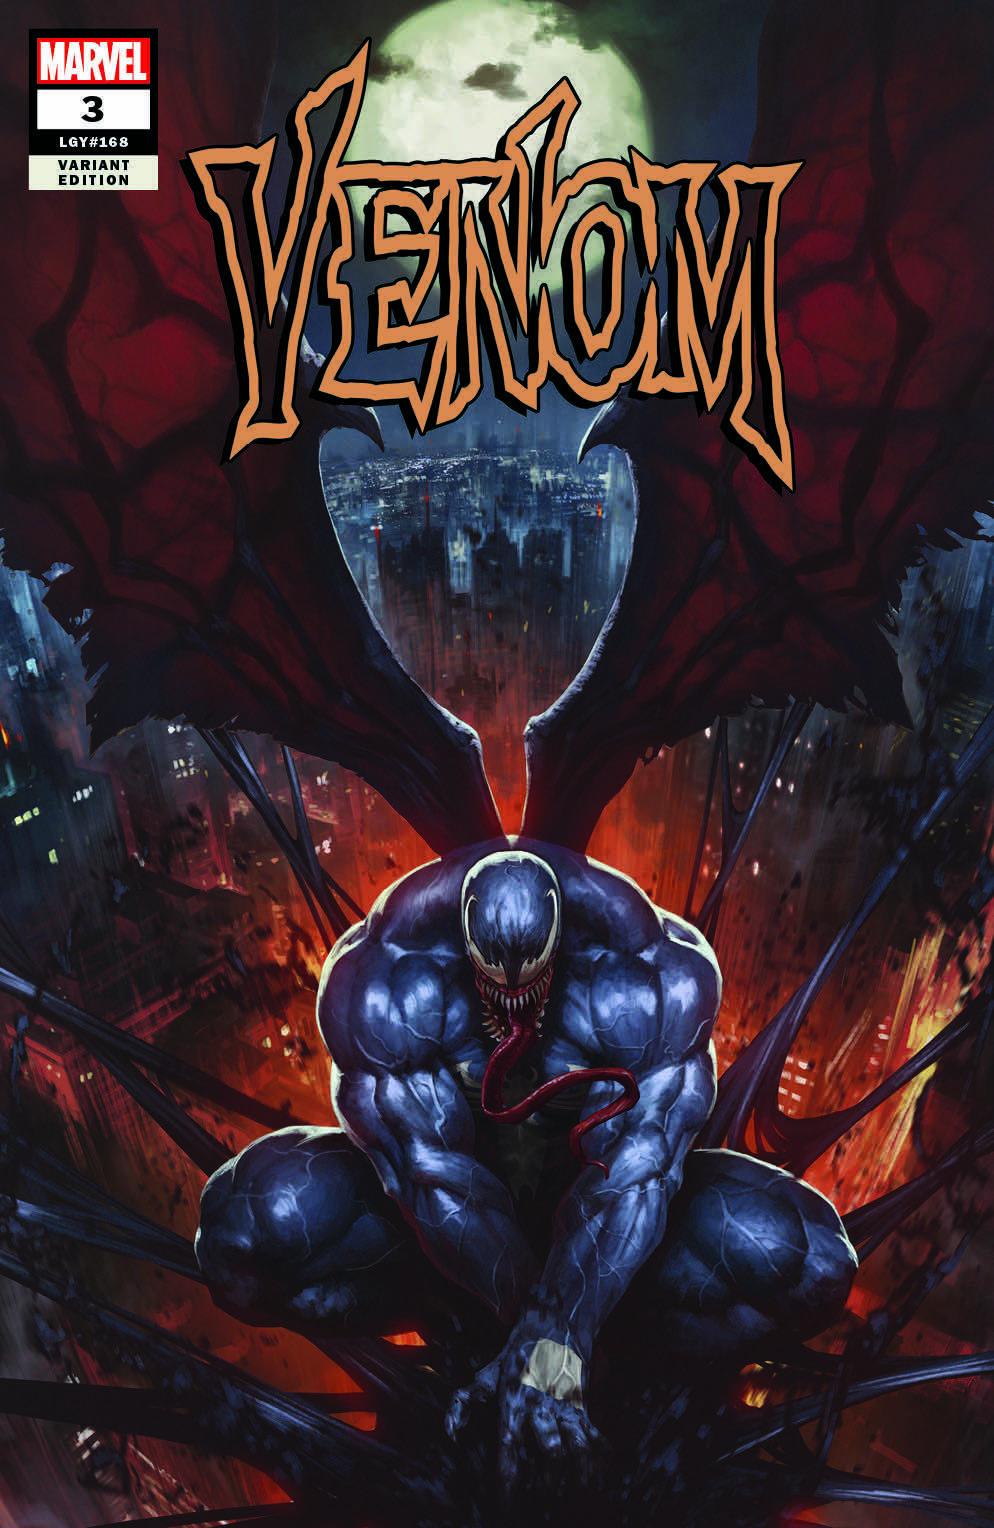 Venom #3 (2018) Exclusive Variant Cover by Skan | art